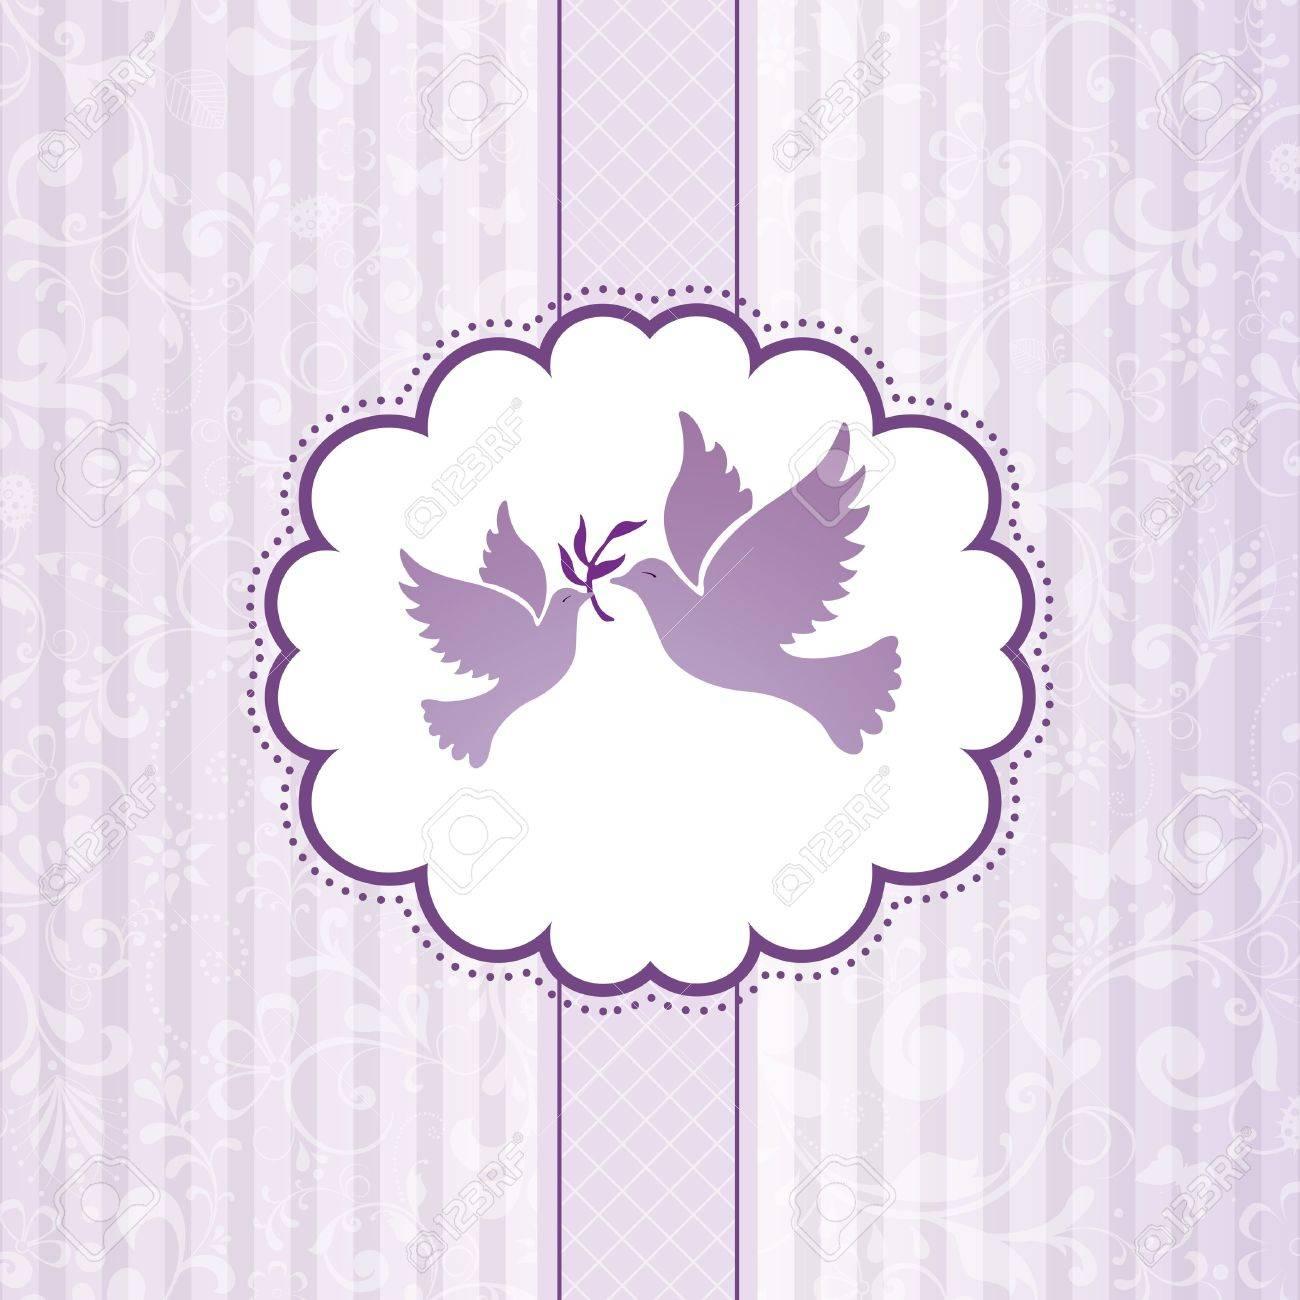 Elegant greeting flowers background illustration Stock Vector - 12495220